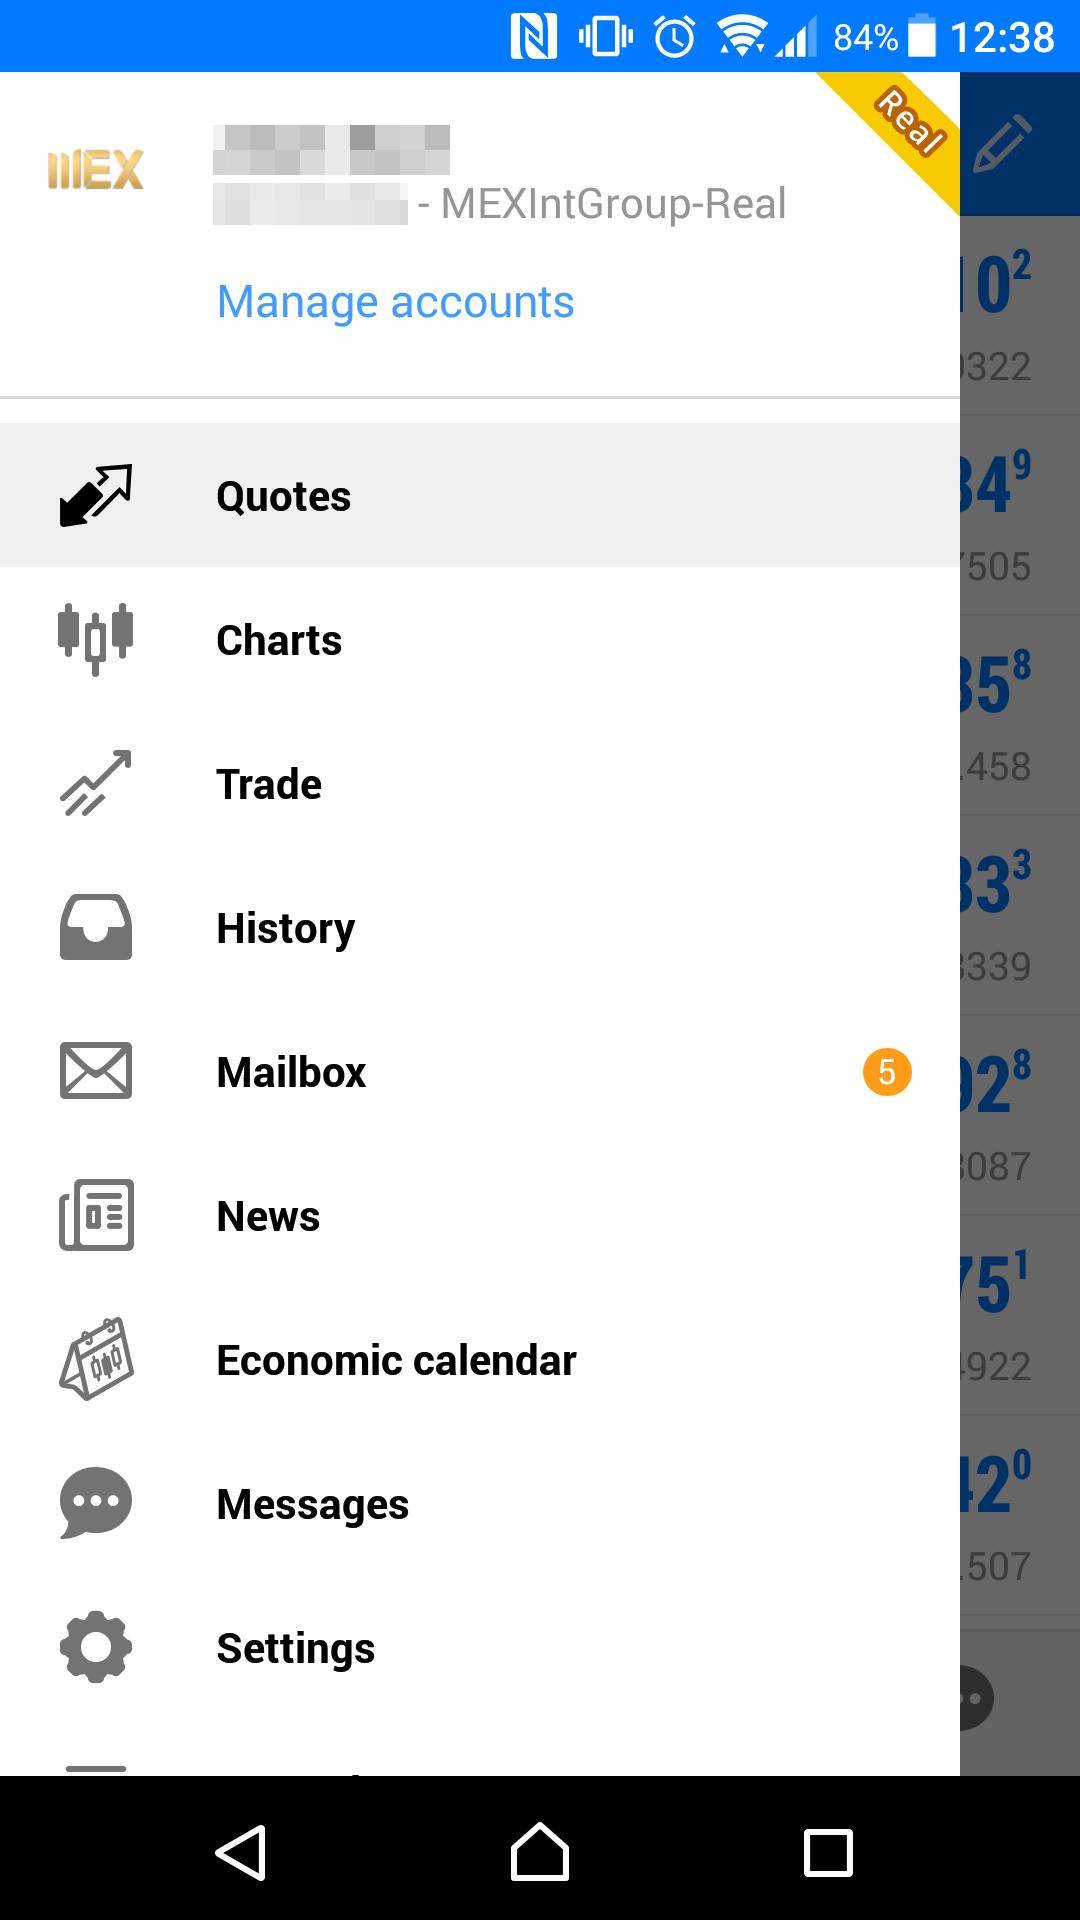 MultiBank review - Mobile trading platform